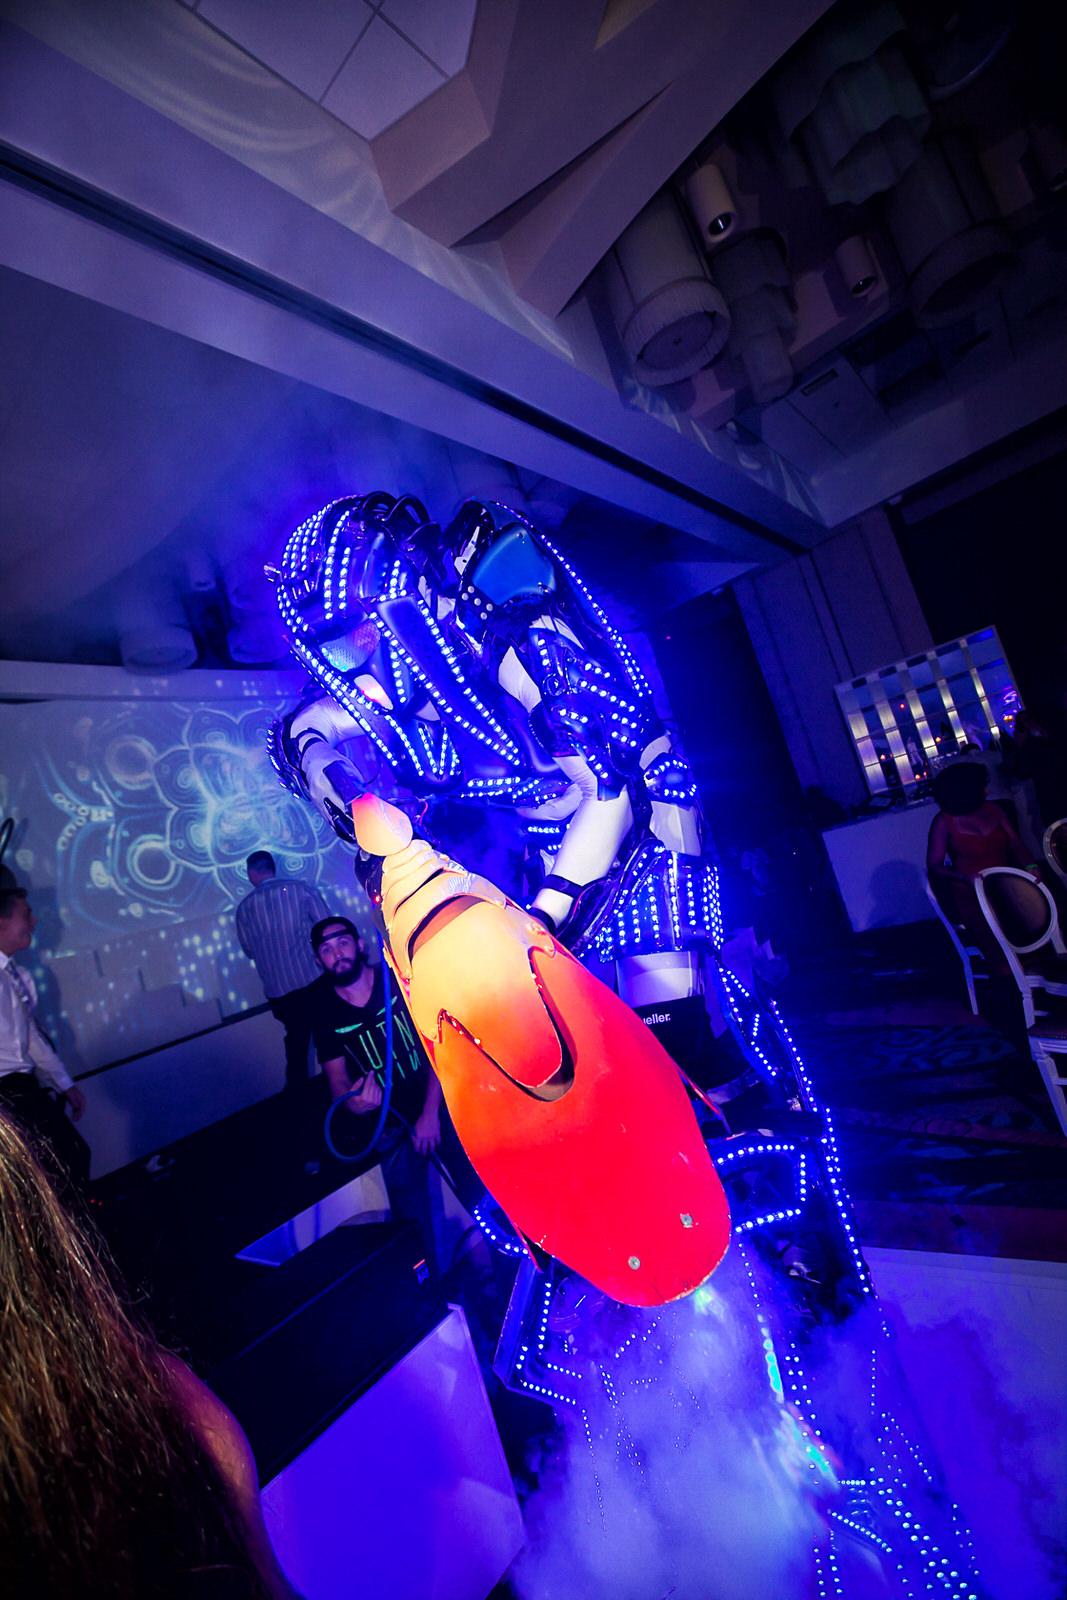 Robot man and his laser gun